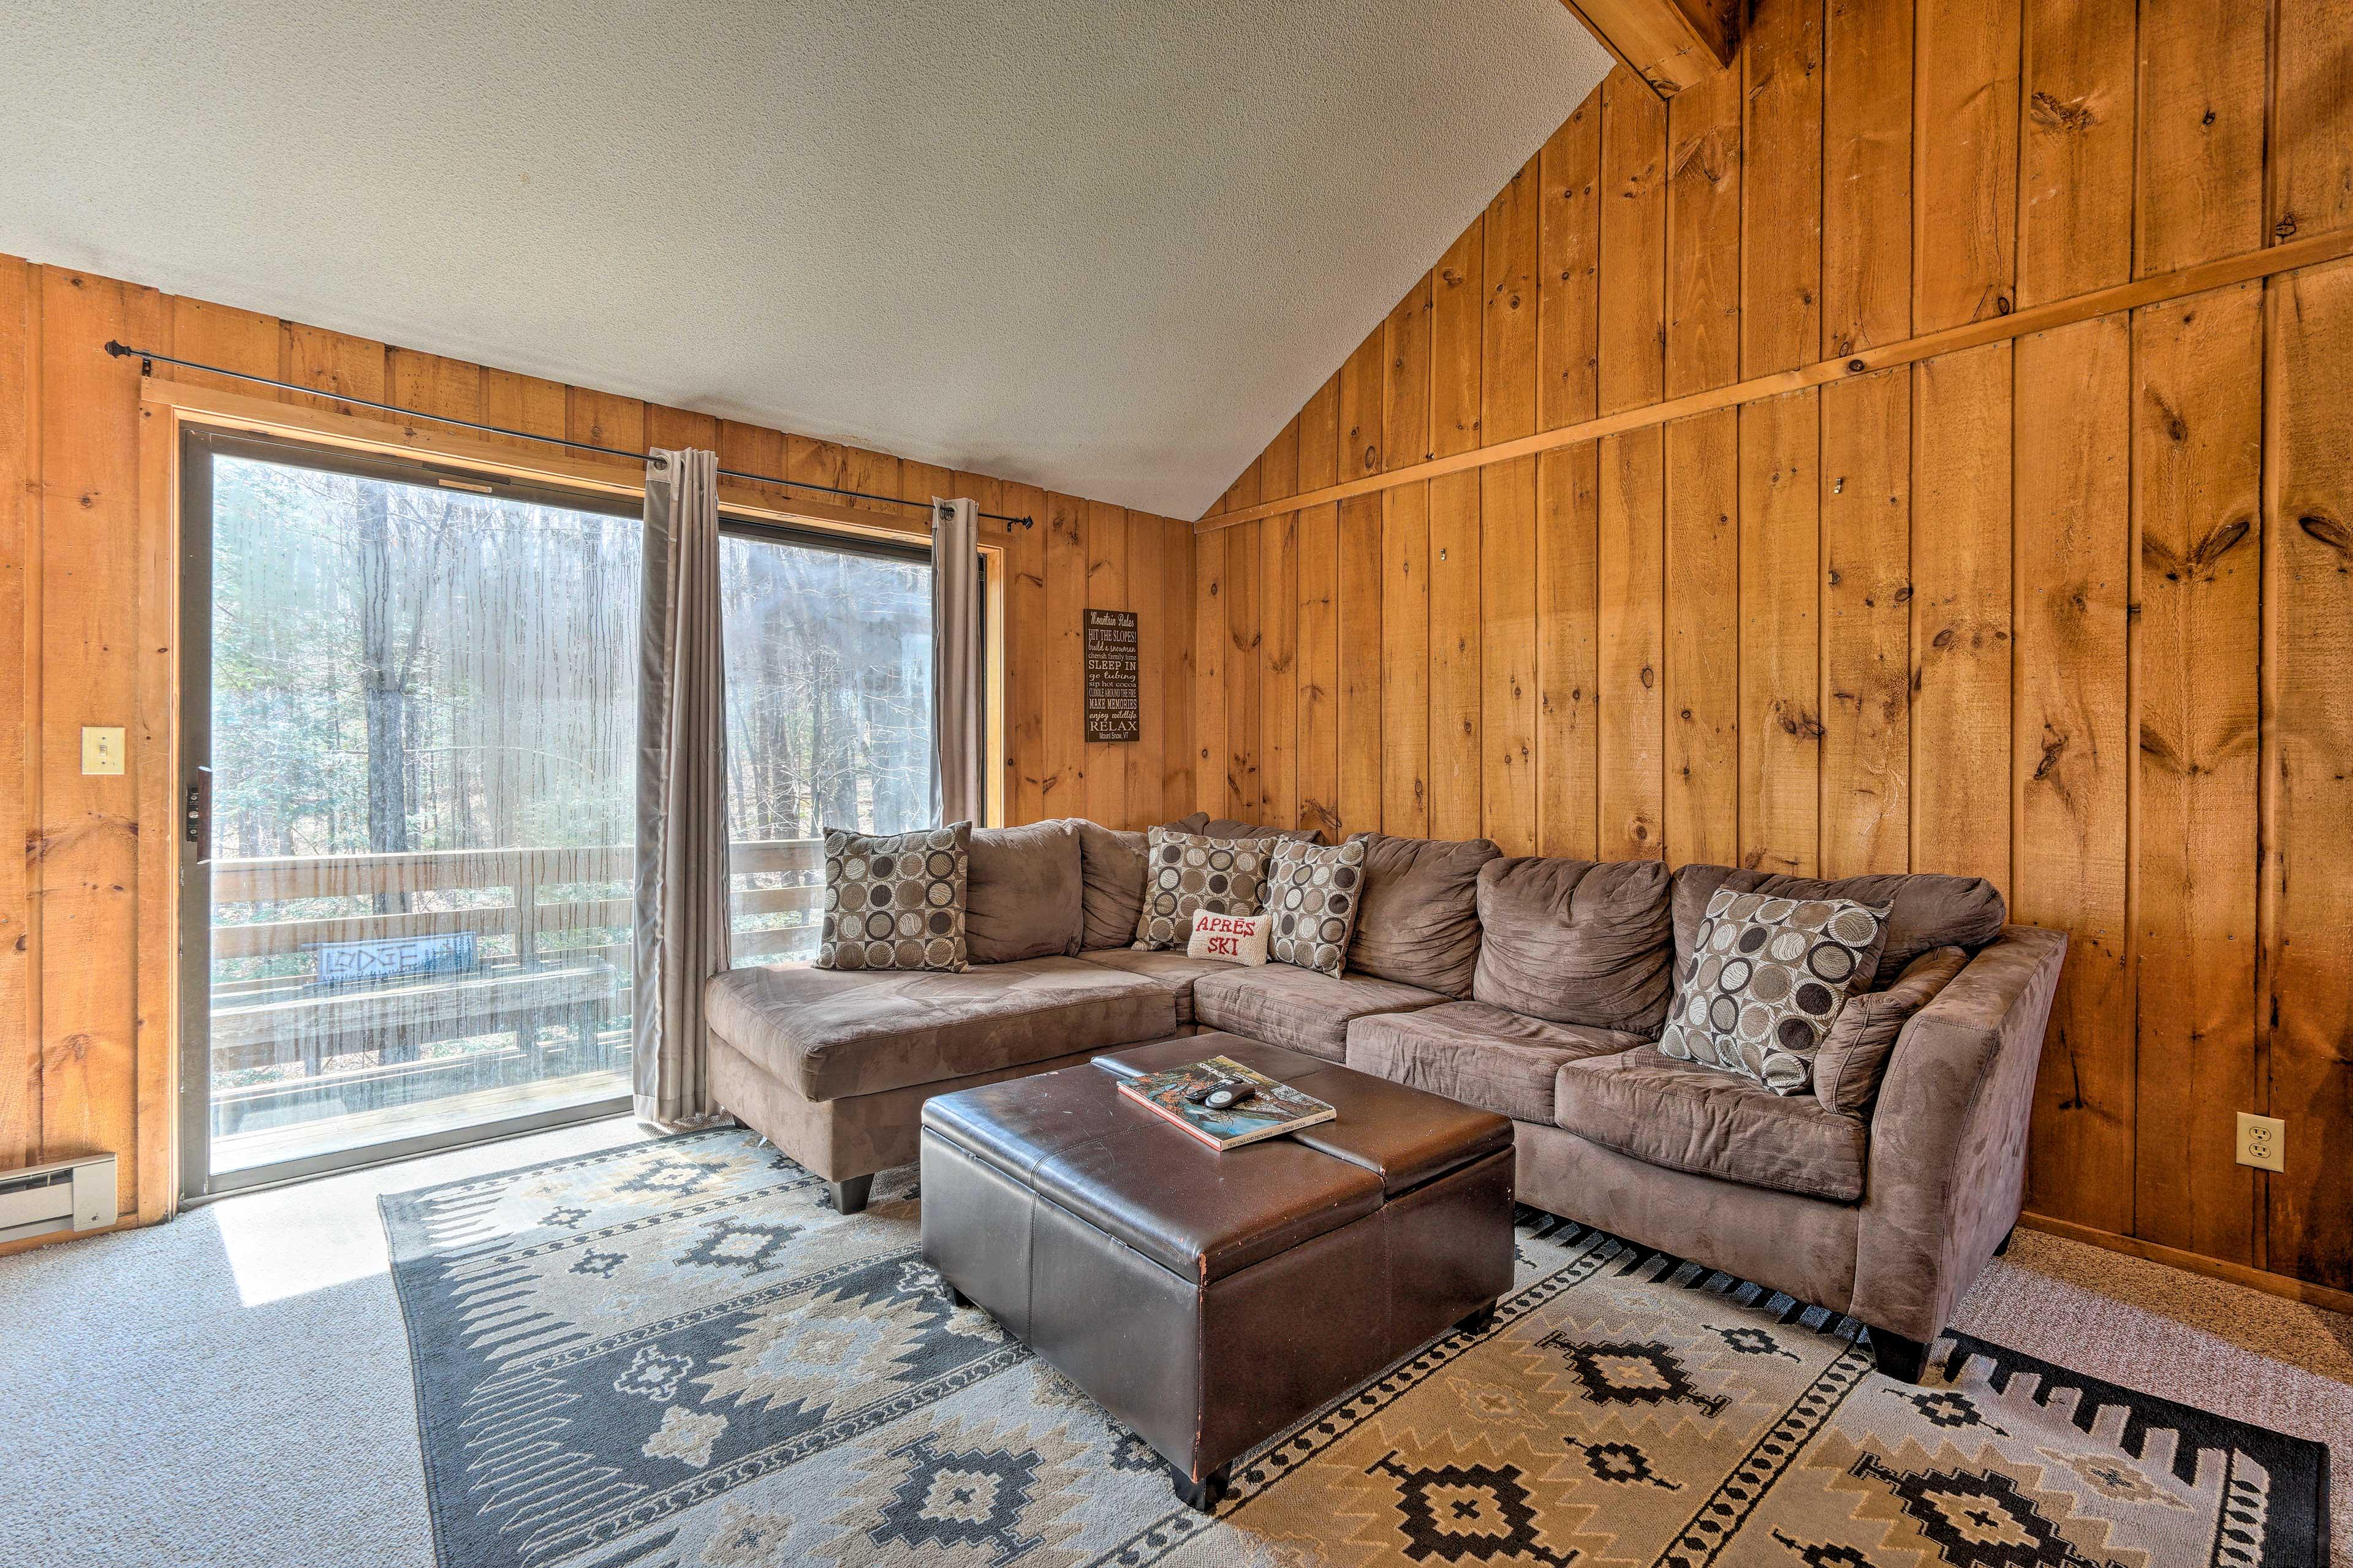 Living Room | Free WiFi | Balcony Access